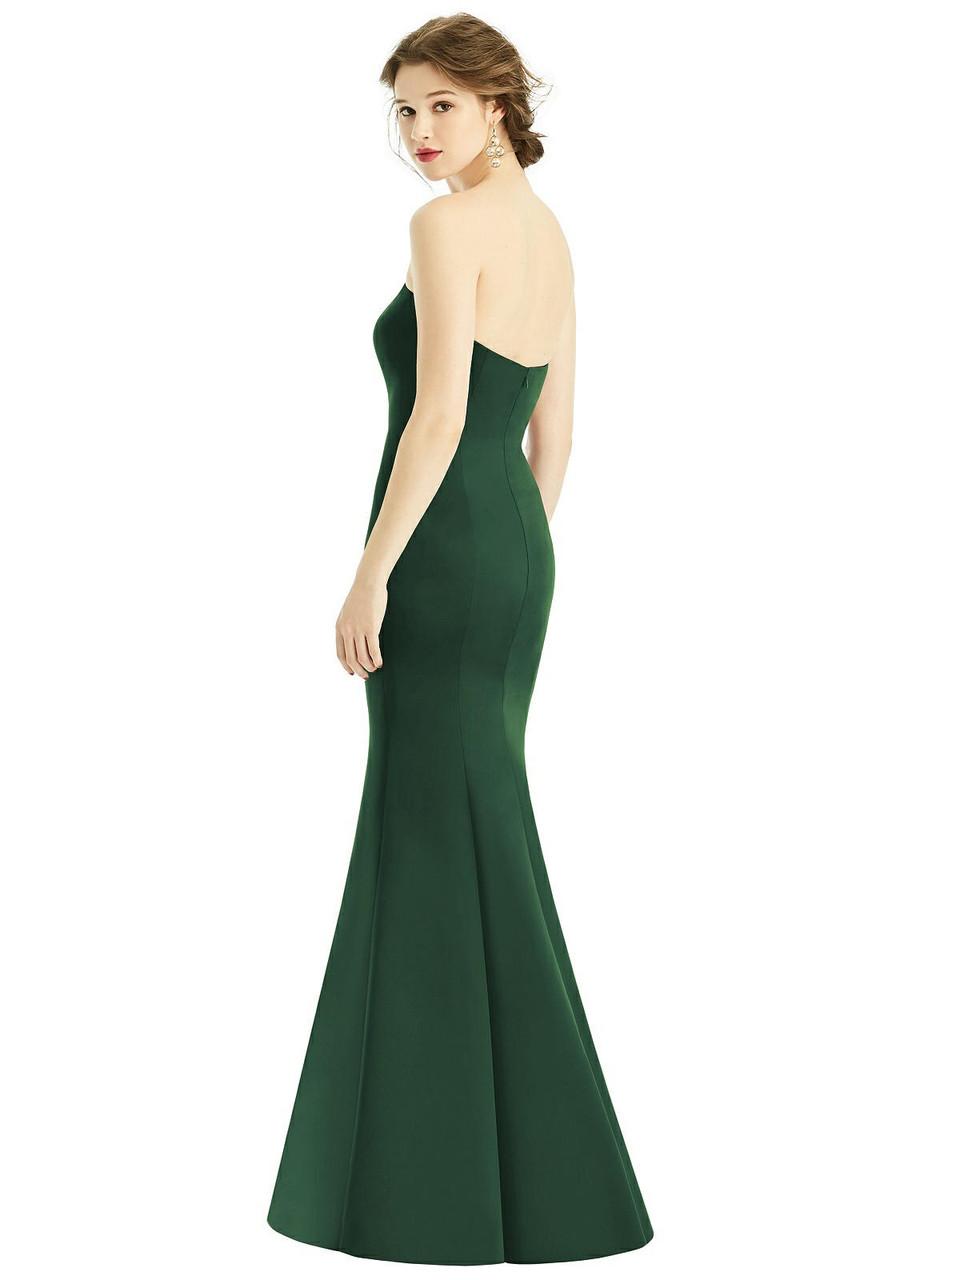 After Six Style 1532  |  Matte Satin - Sweetheart Strapless Satin Mermaid Dress